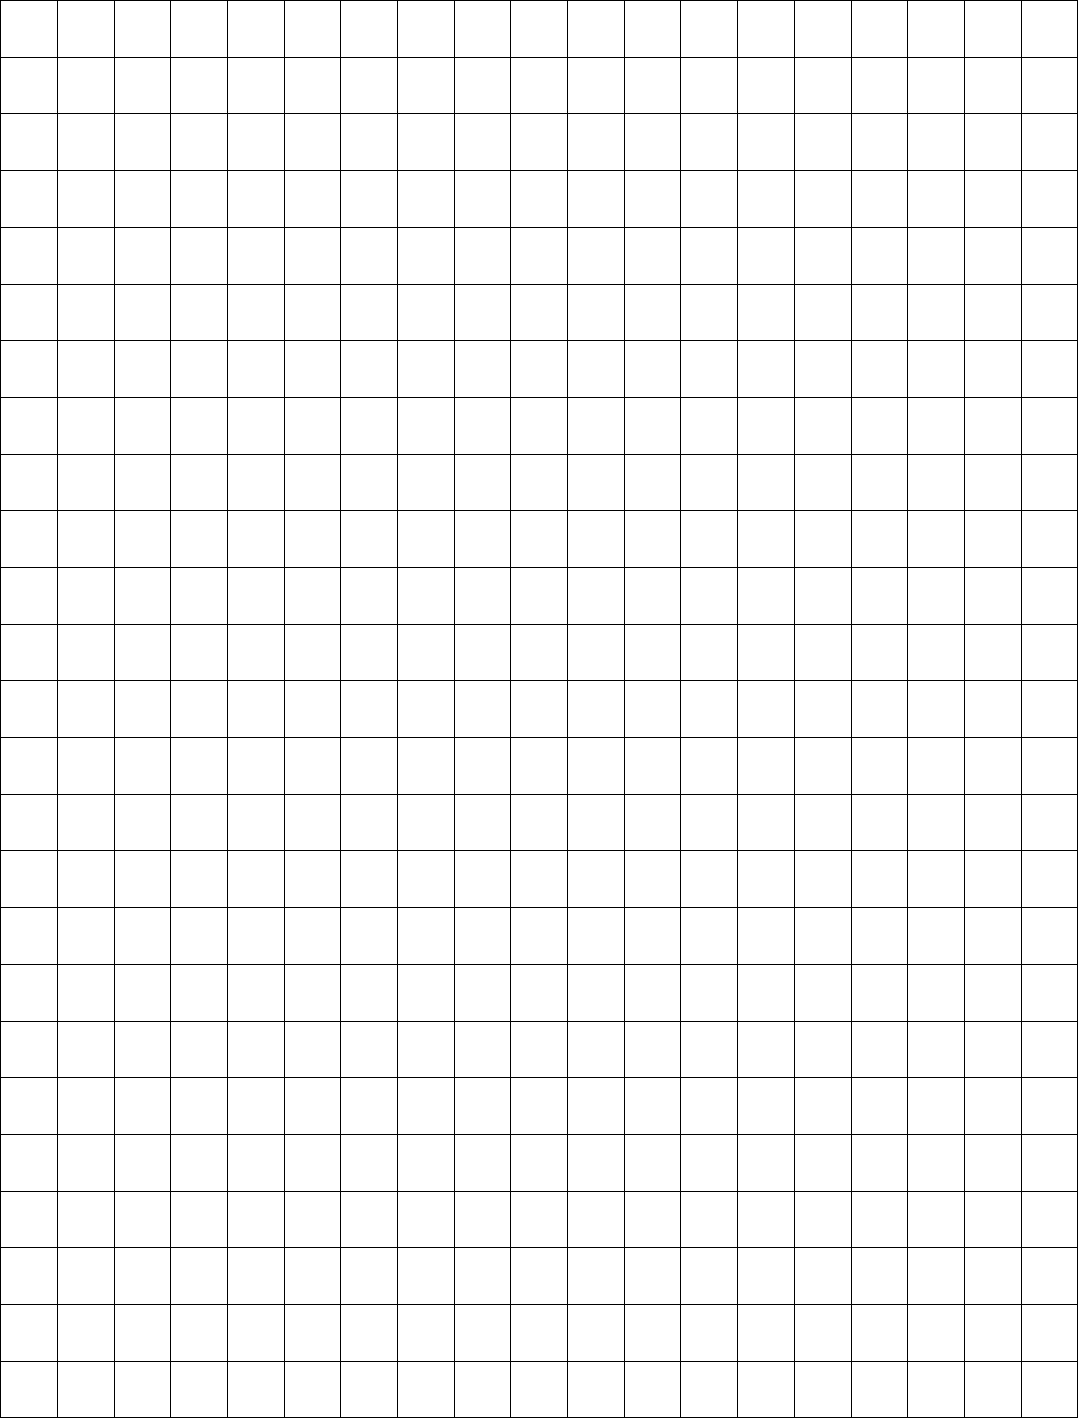 centimeter graph paper 1